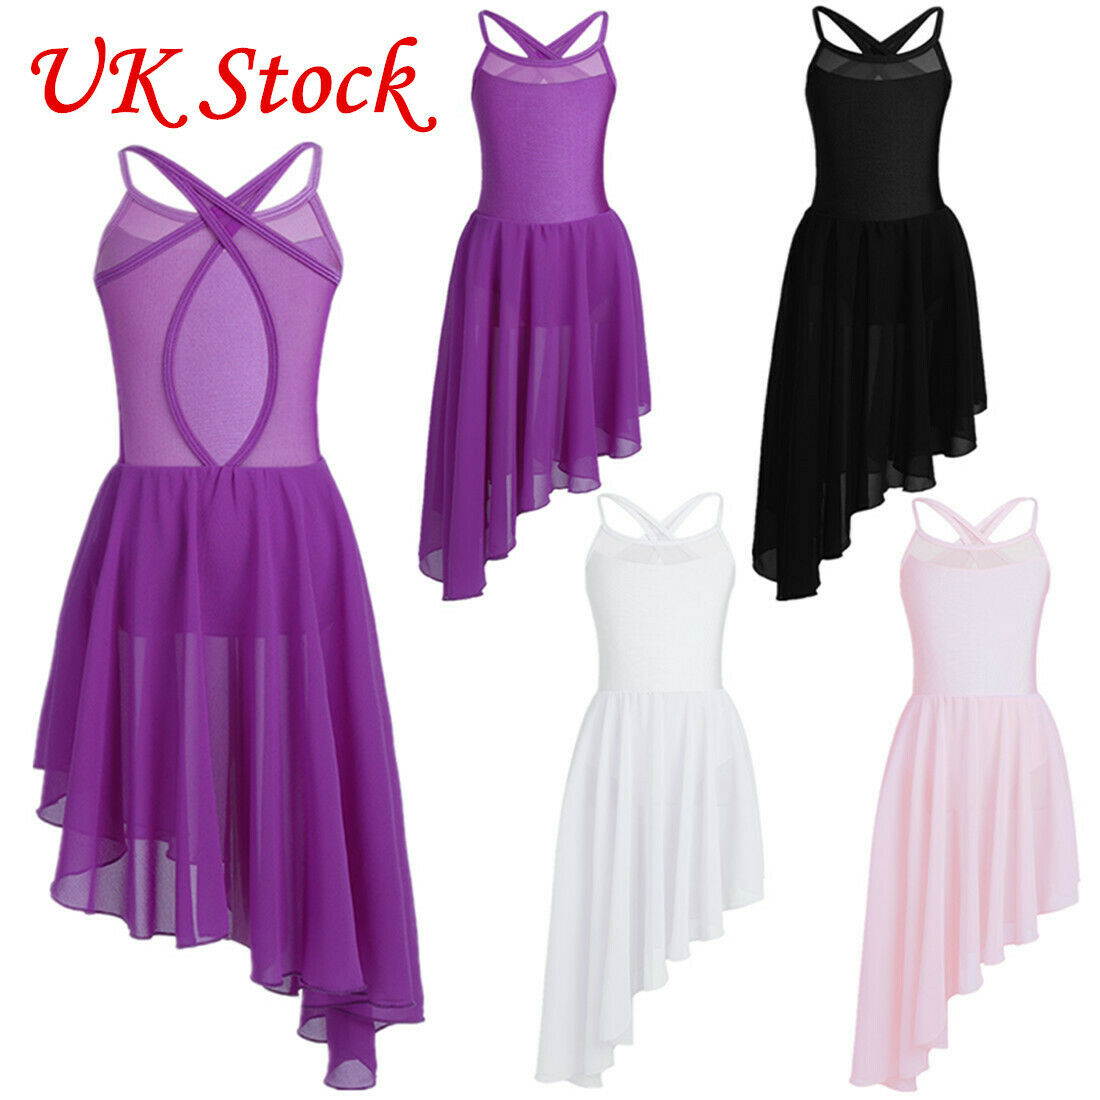 UK! Girls Lyrical Ballet Dance Dress Racer back Leotard Pleated Skirt Dancewear